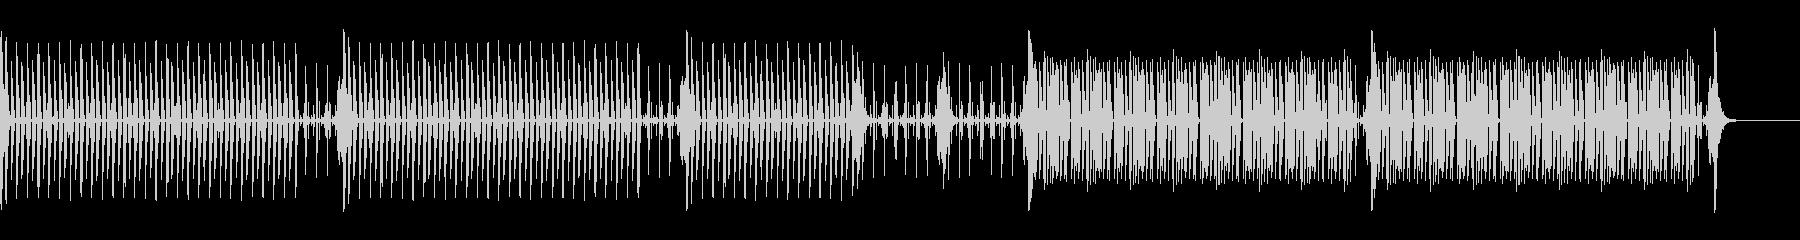 News25 Short ドラムのみの未再生の波形